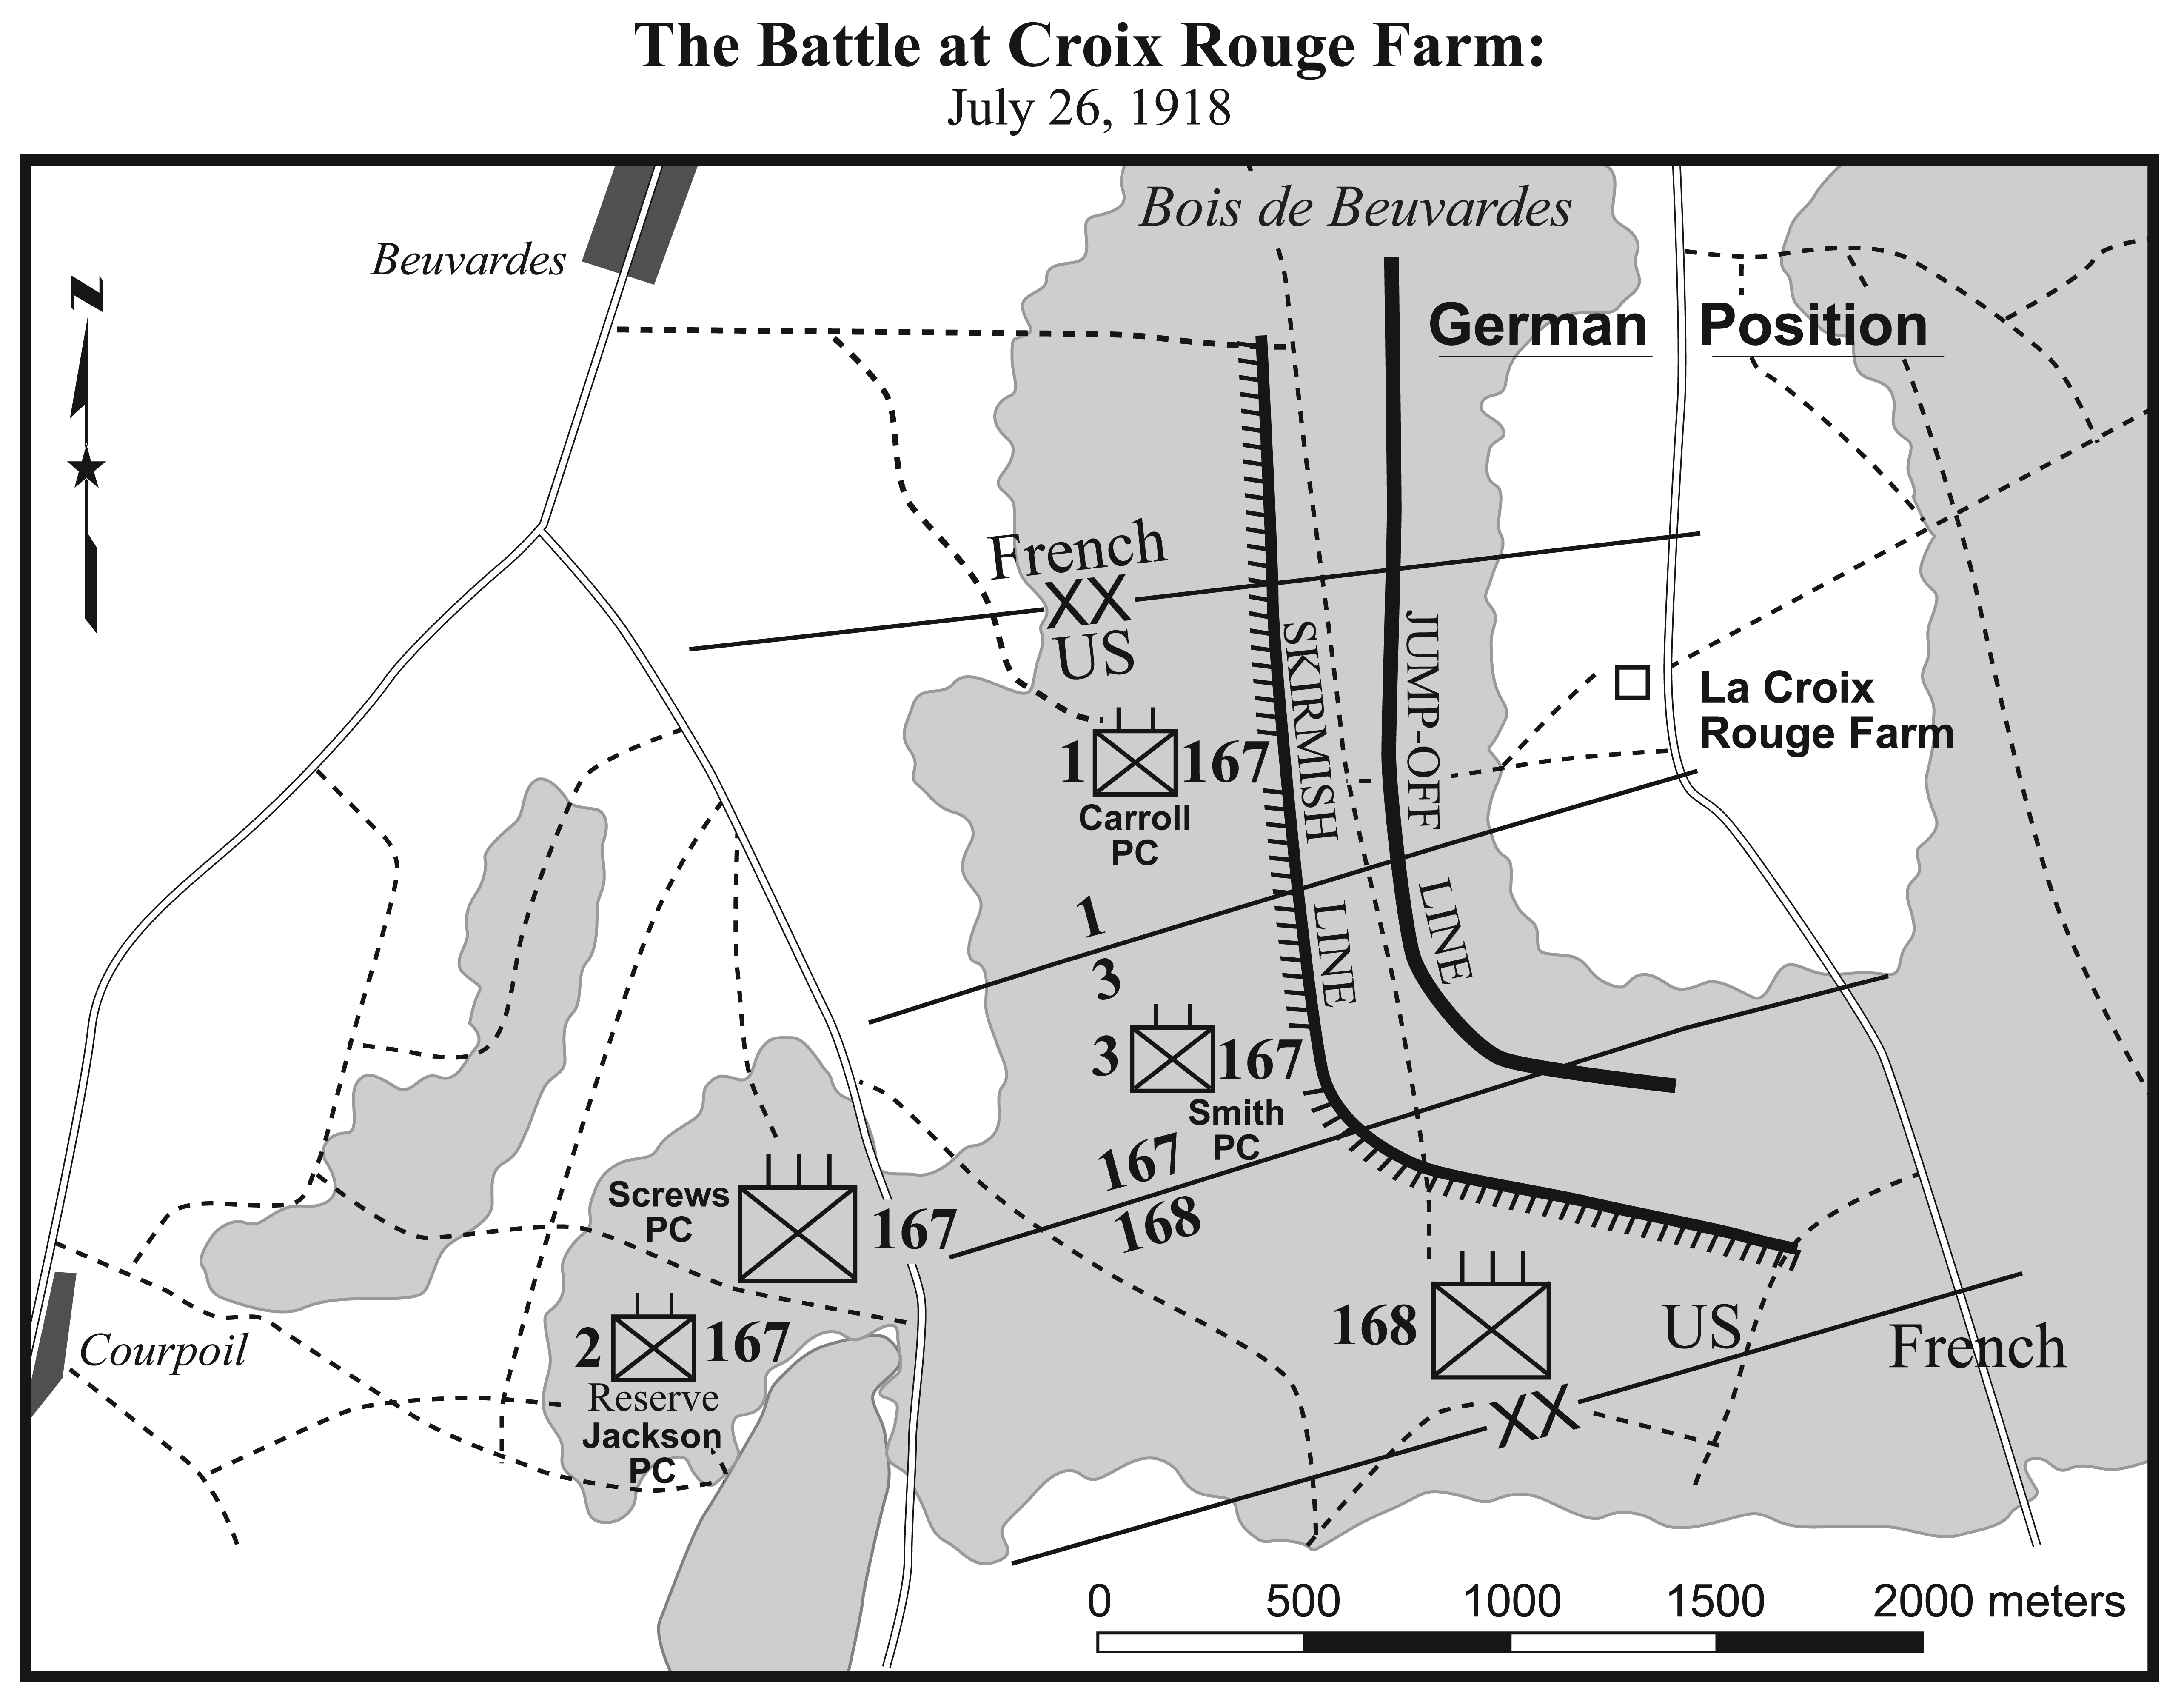 II.3. The Battle at Croix Rouge Farm.